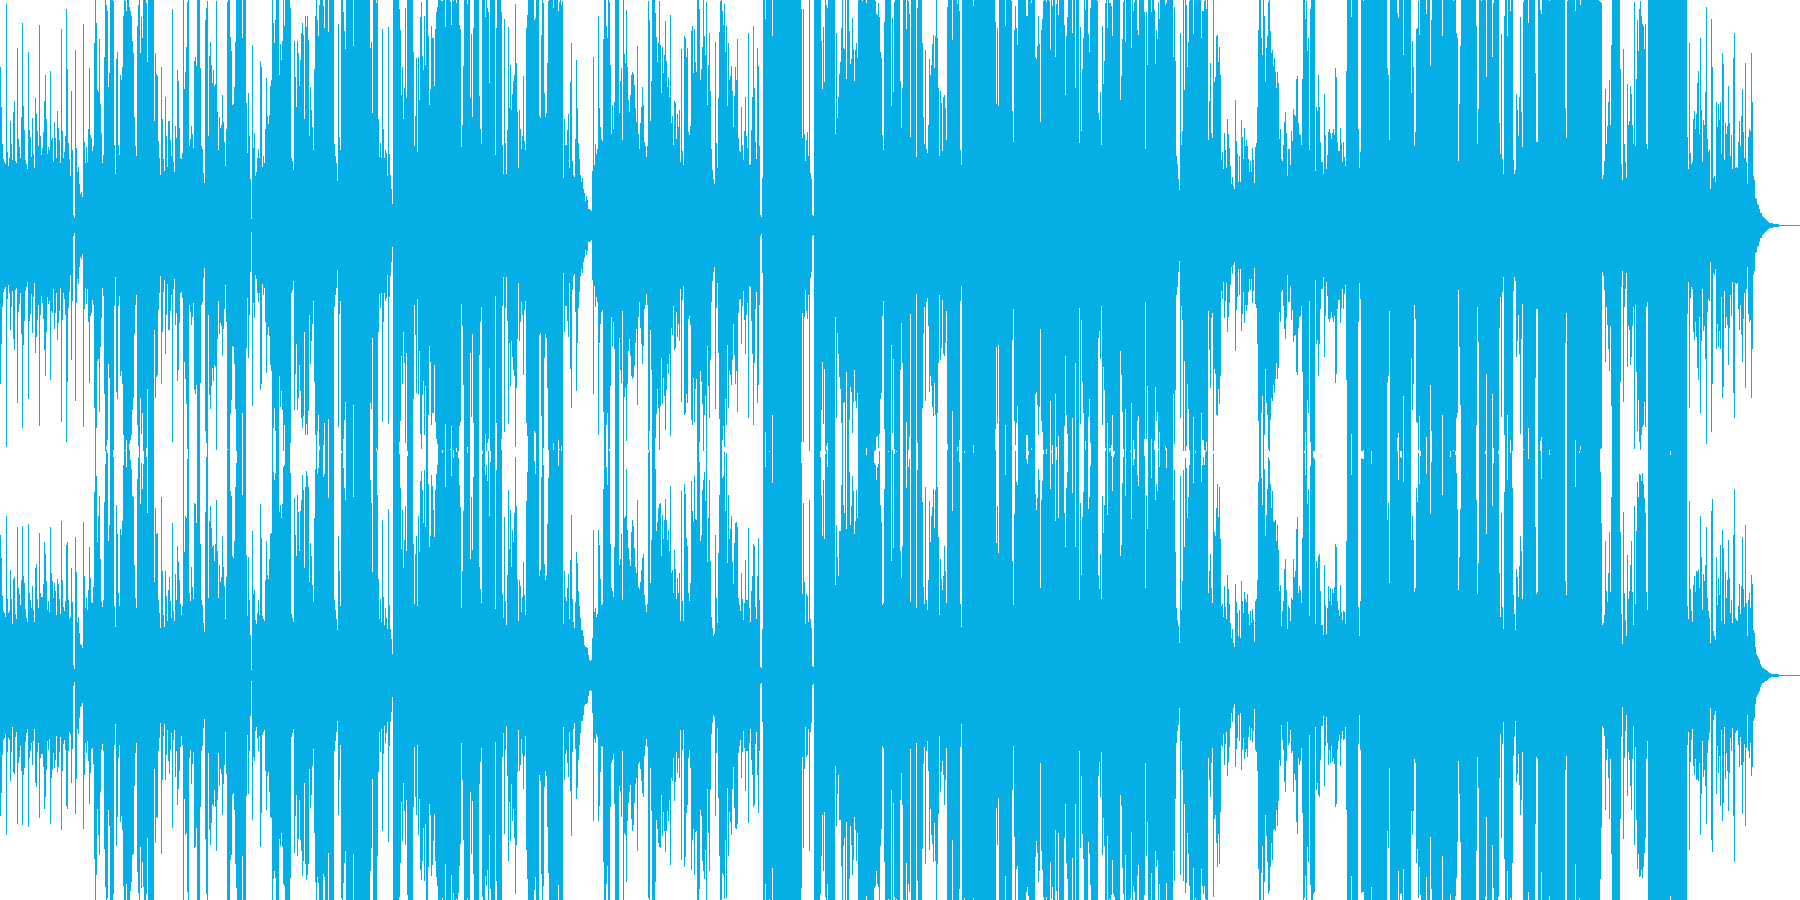 Blues-like pop music's reproduced waveform